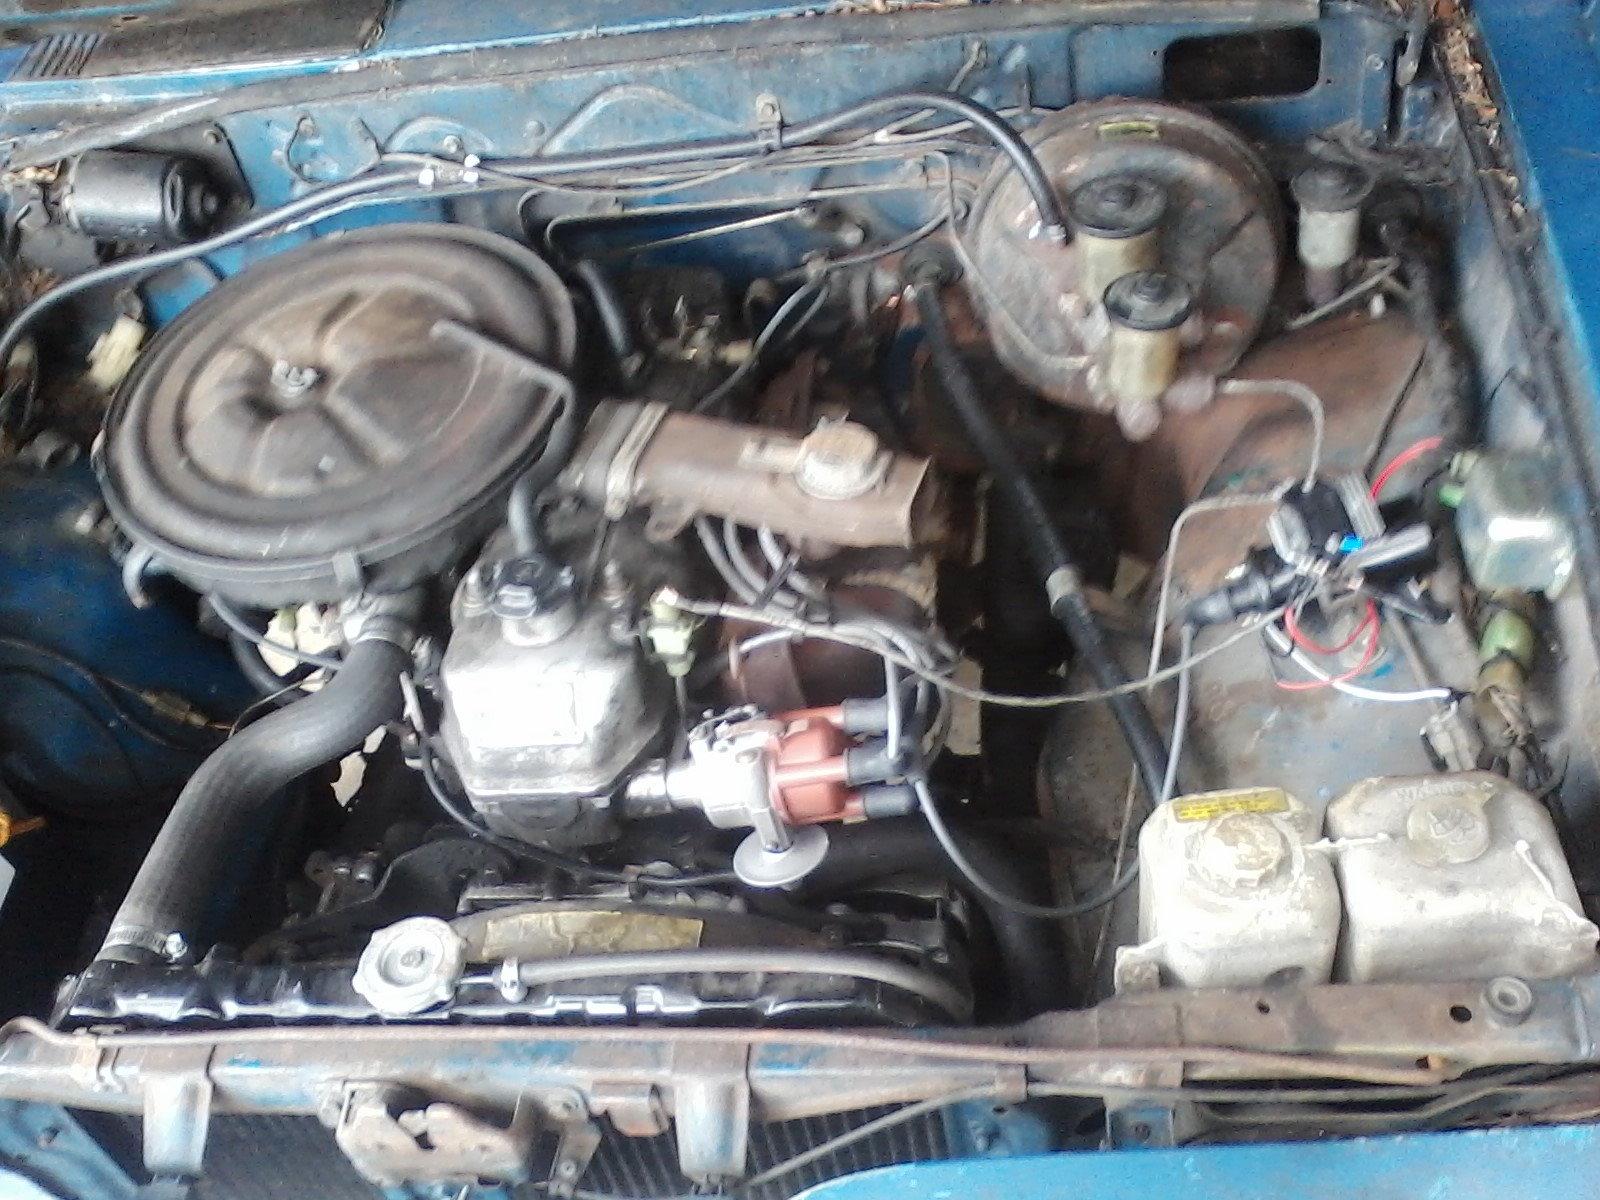 1978 Toyota Pickup 20r Won U0026 39 T Stay Running